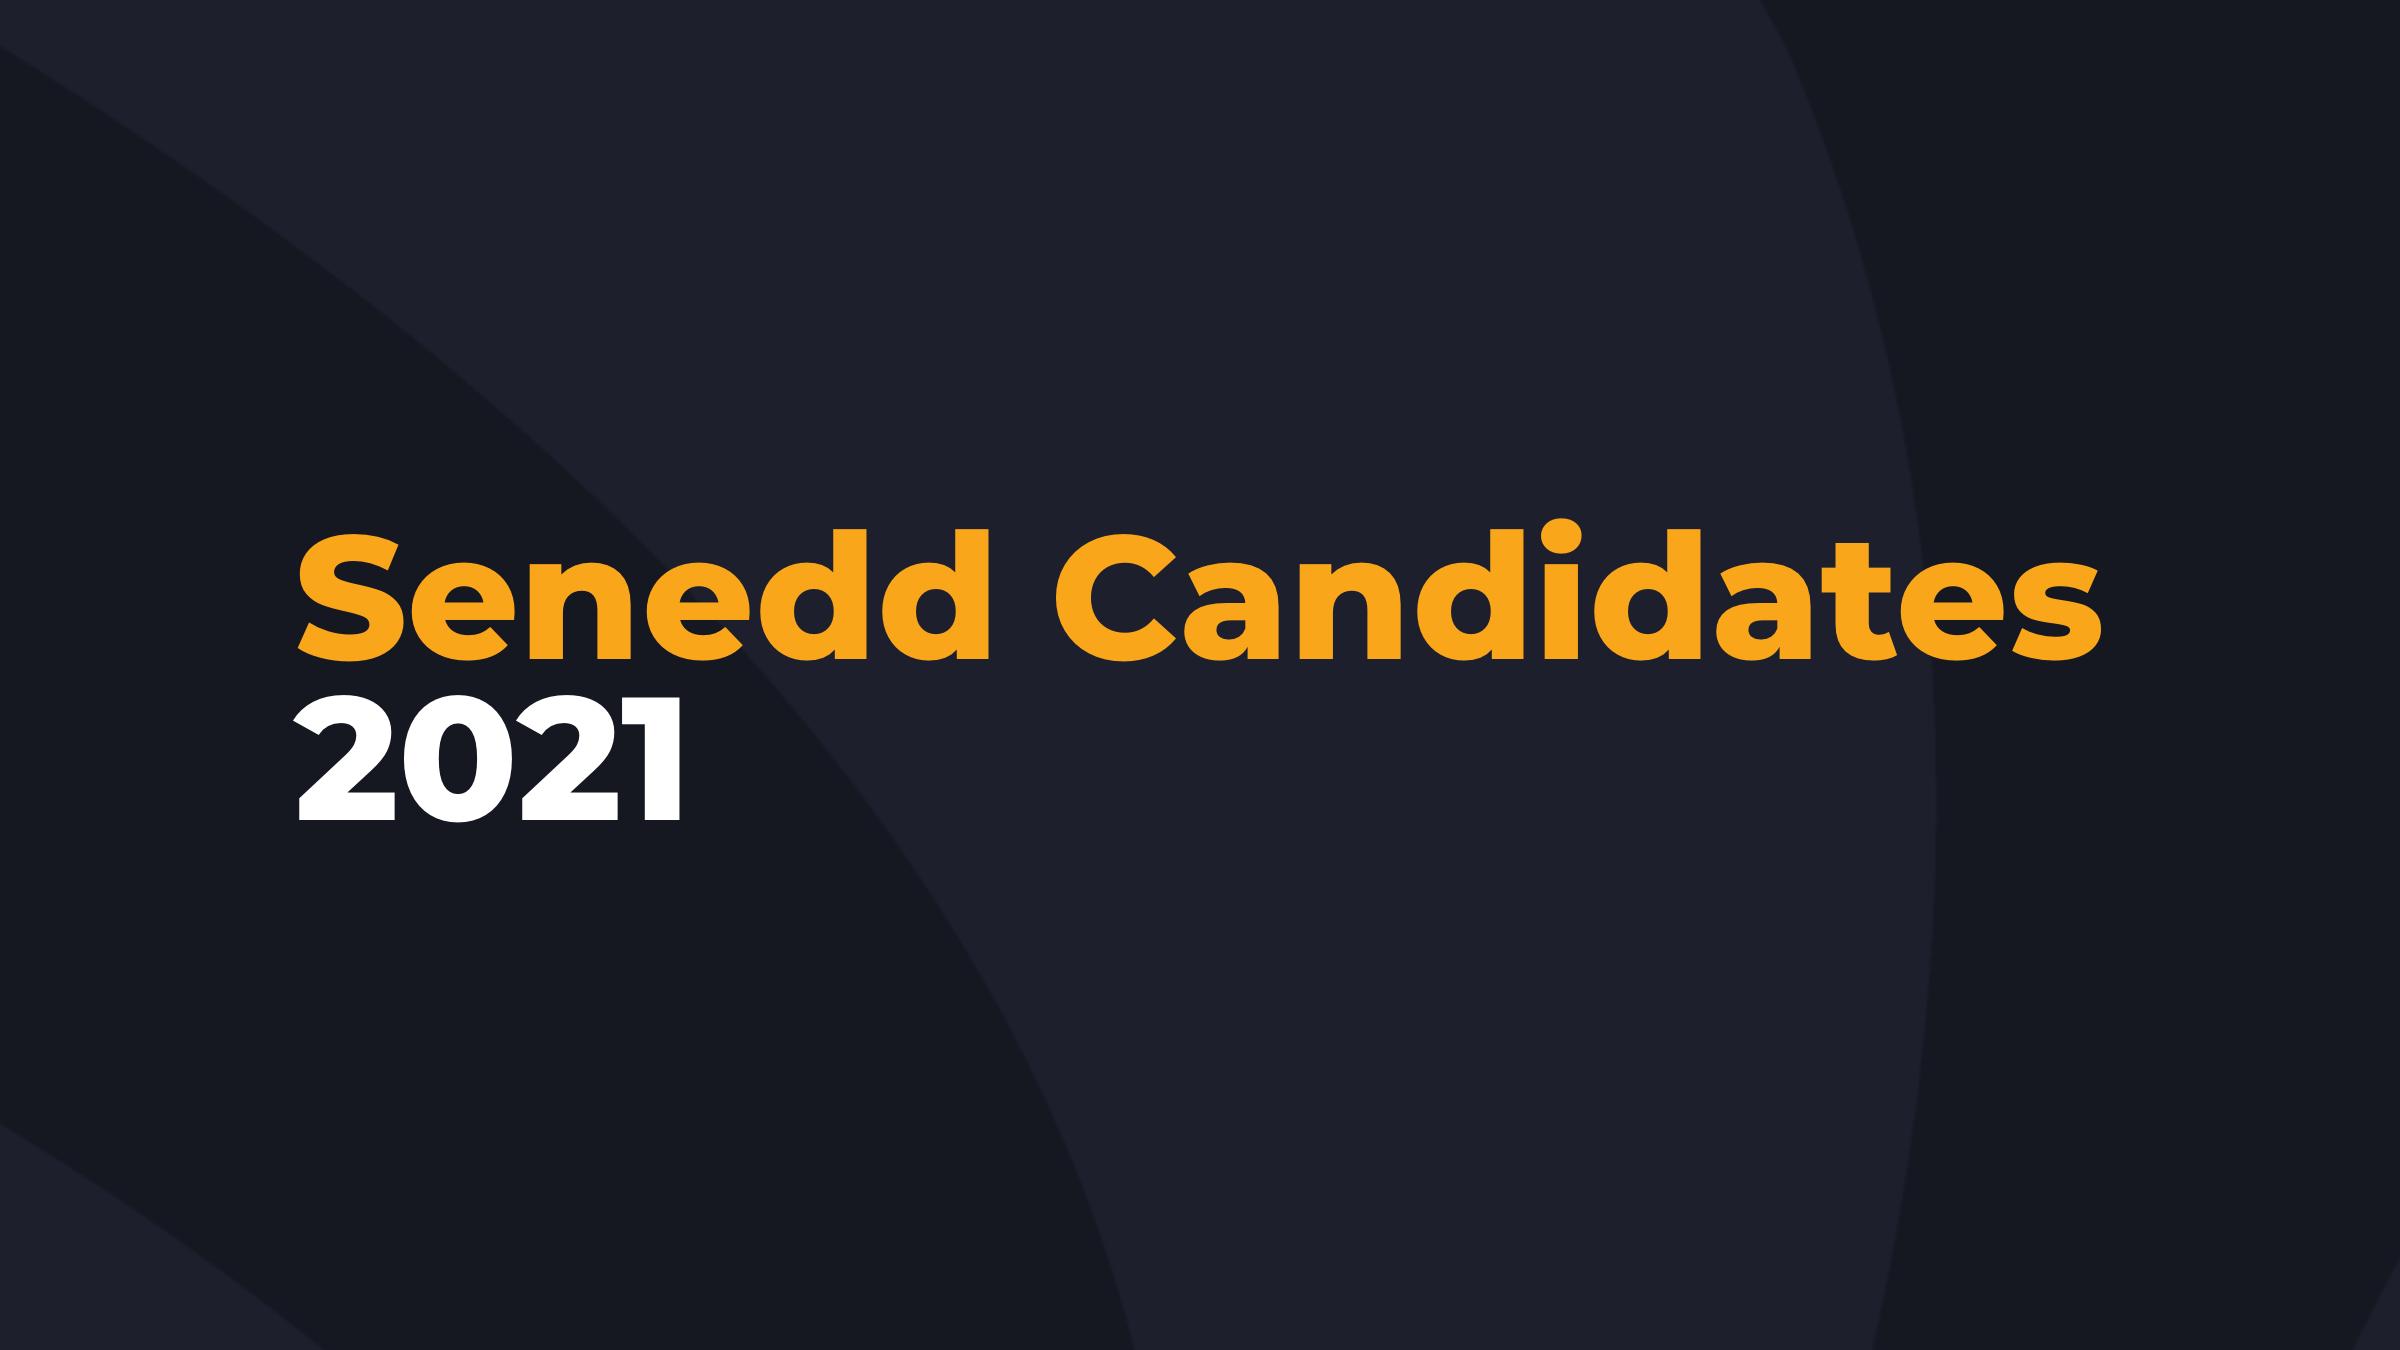 Senedd Candidates